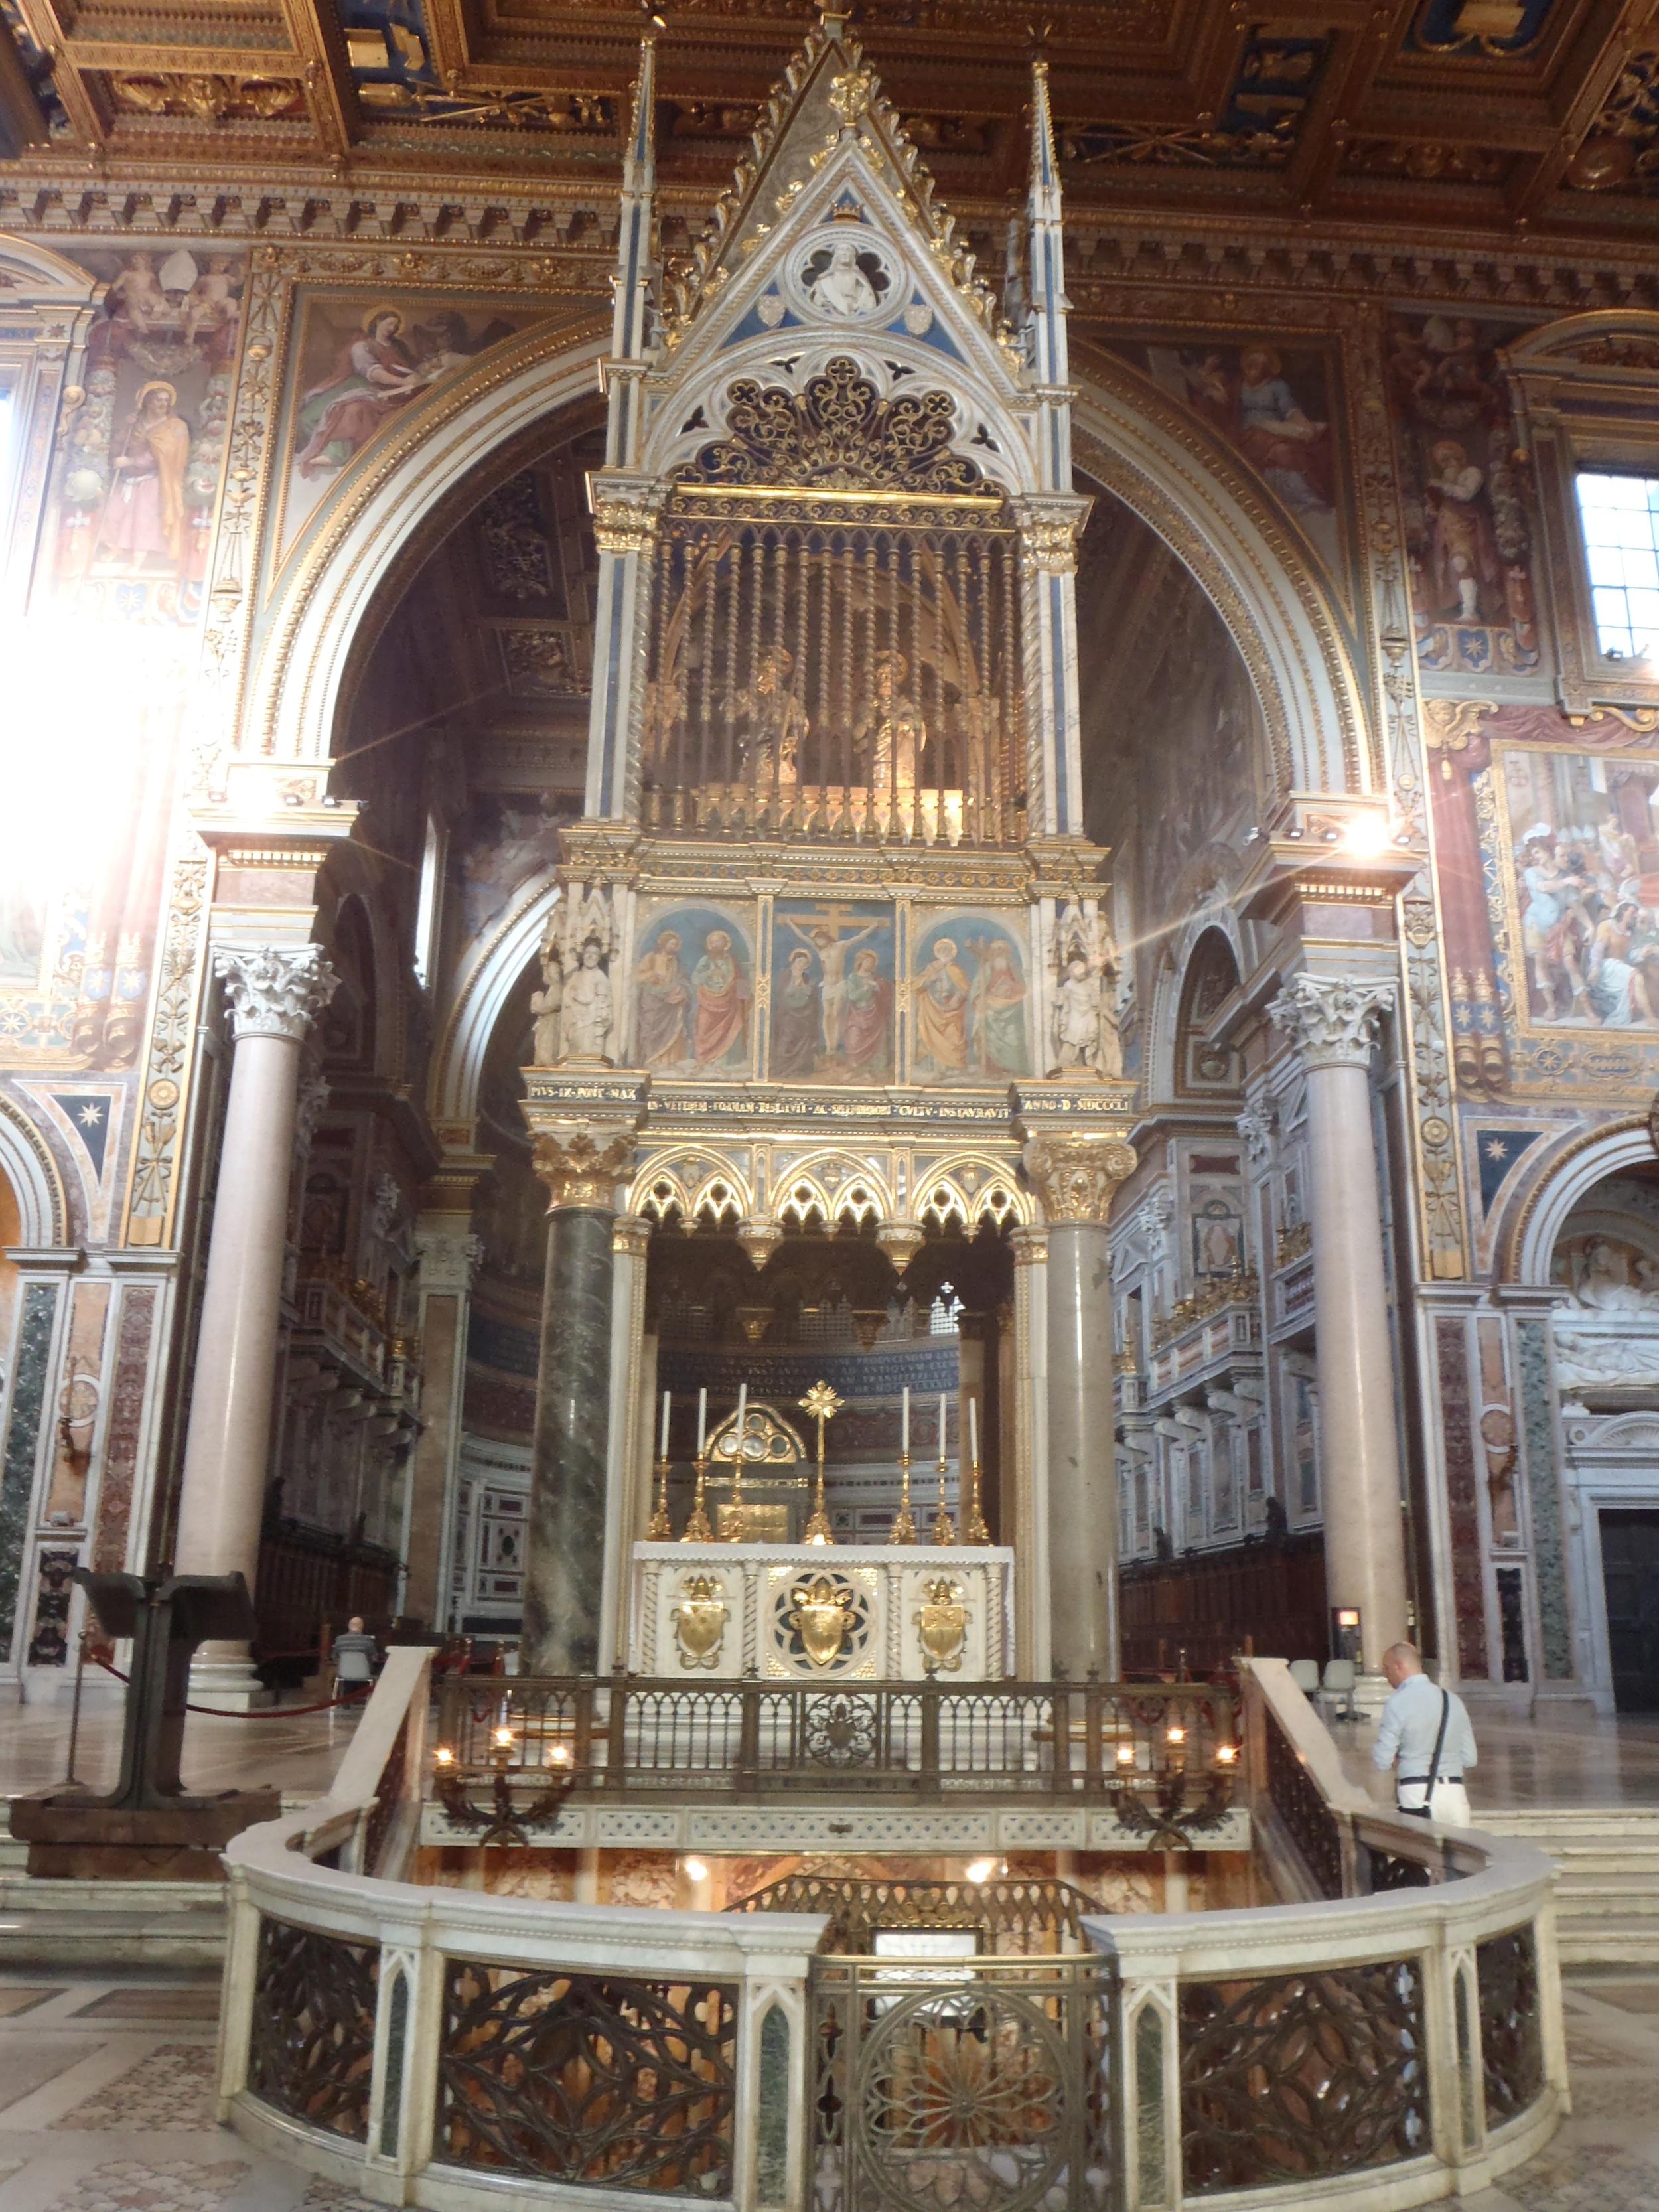 CRO Italy web 2012 - 56.JPG